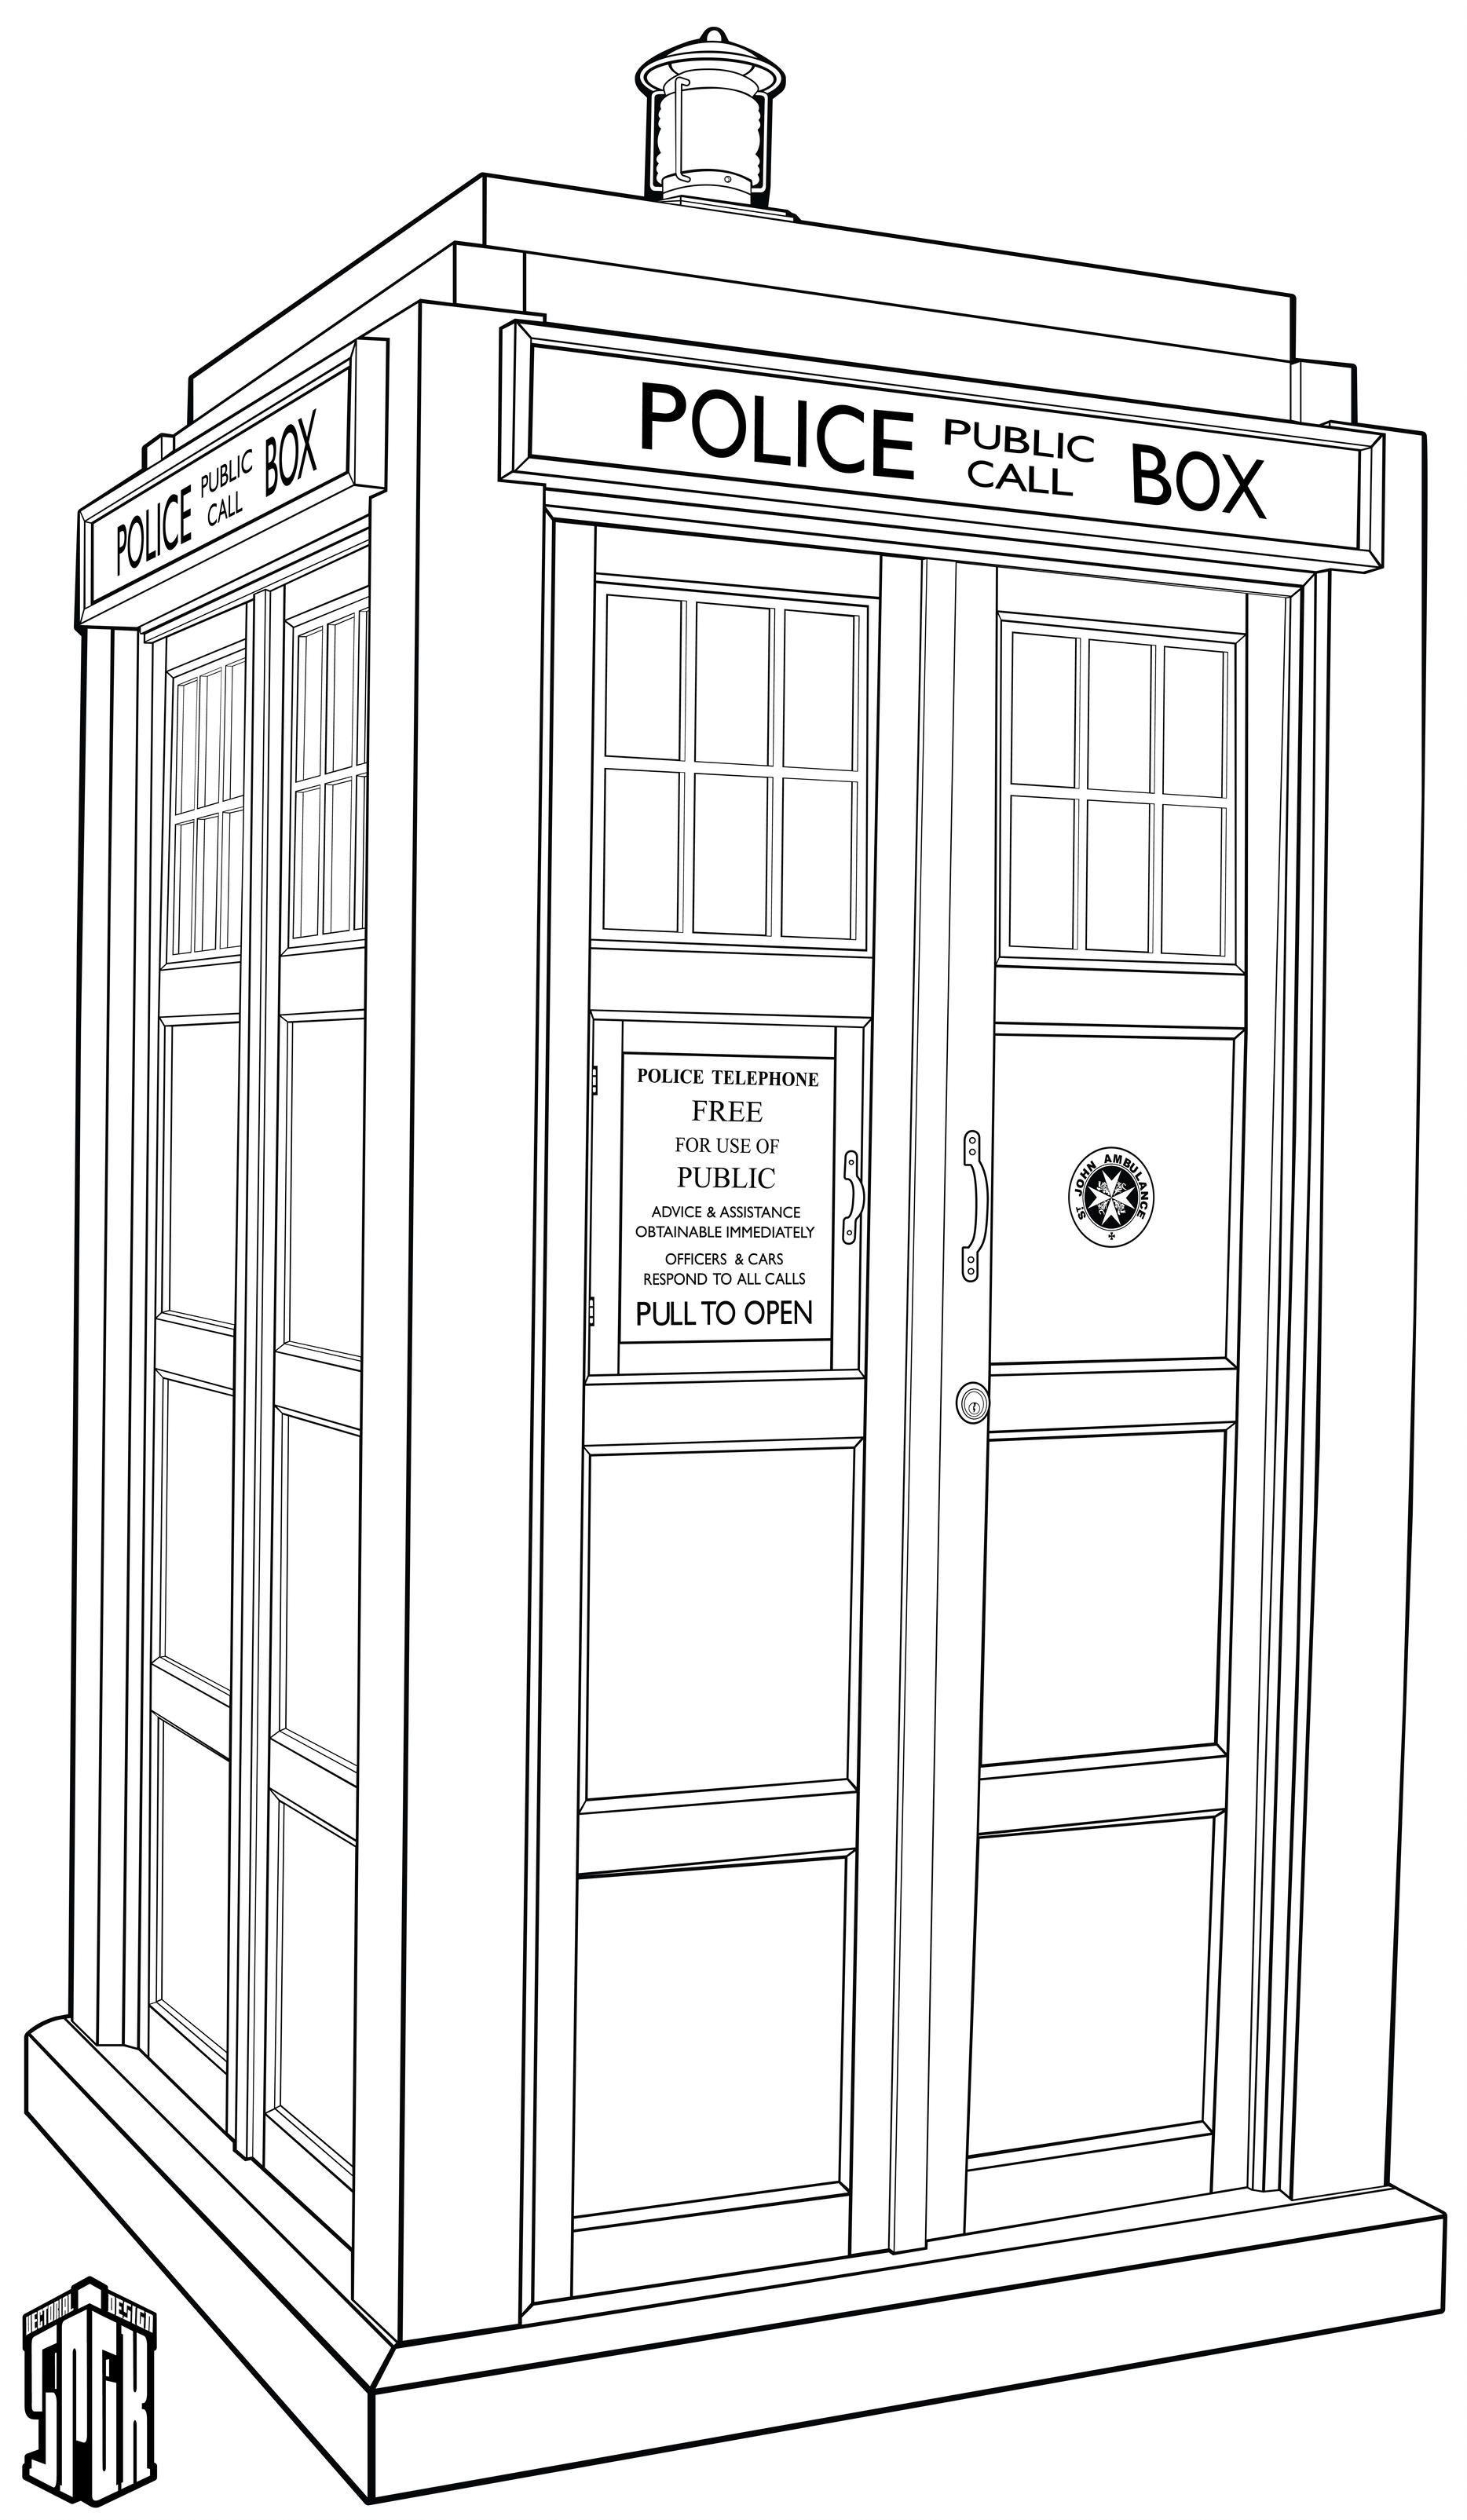 Doctor Who Tardis Ex B W V 2 By Spgk Doctor Who Art Tardis Art Doctor Who Fan Art